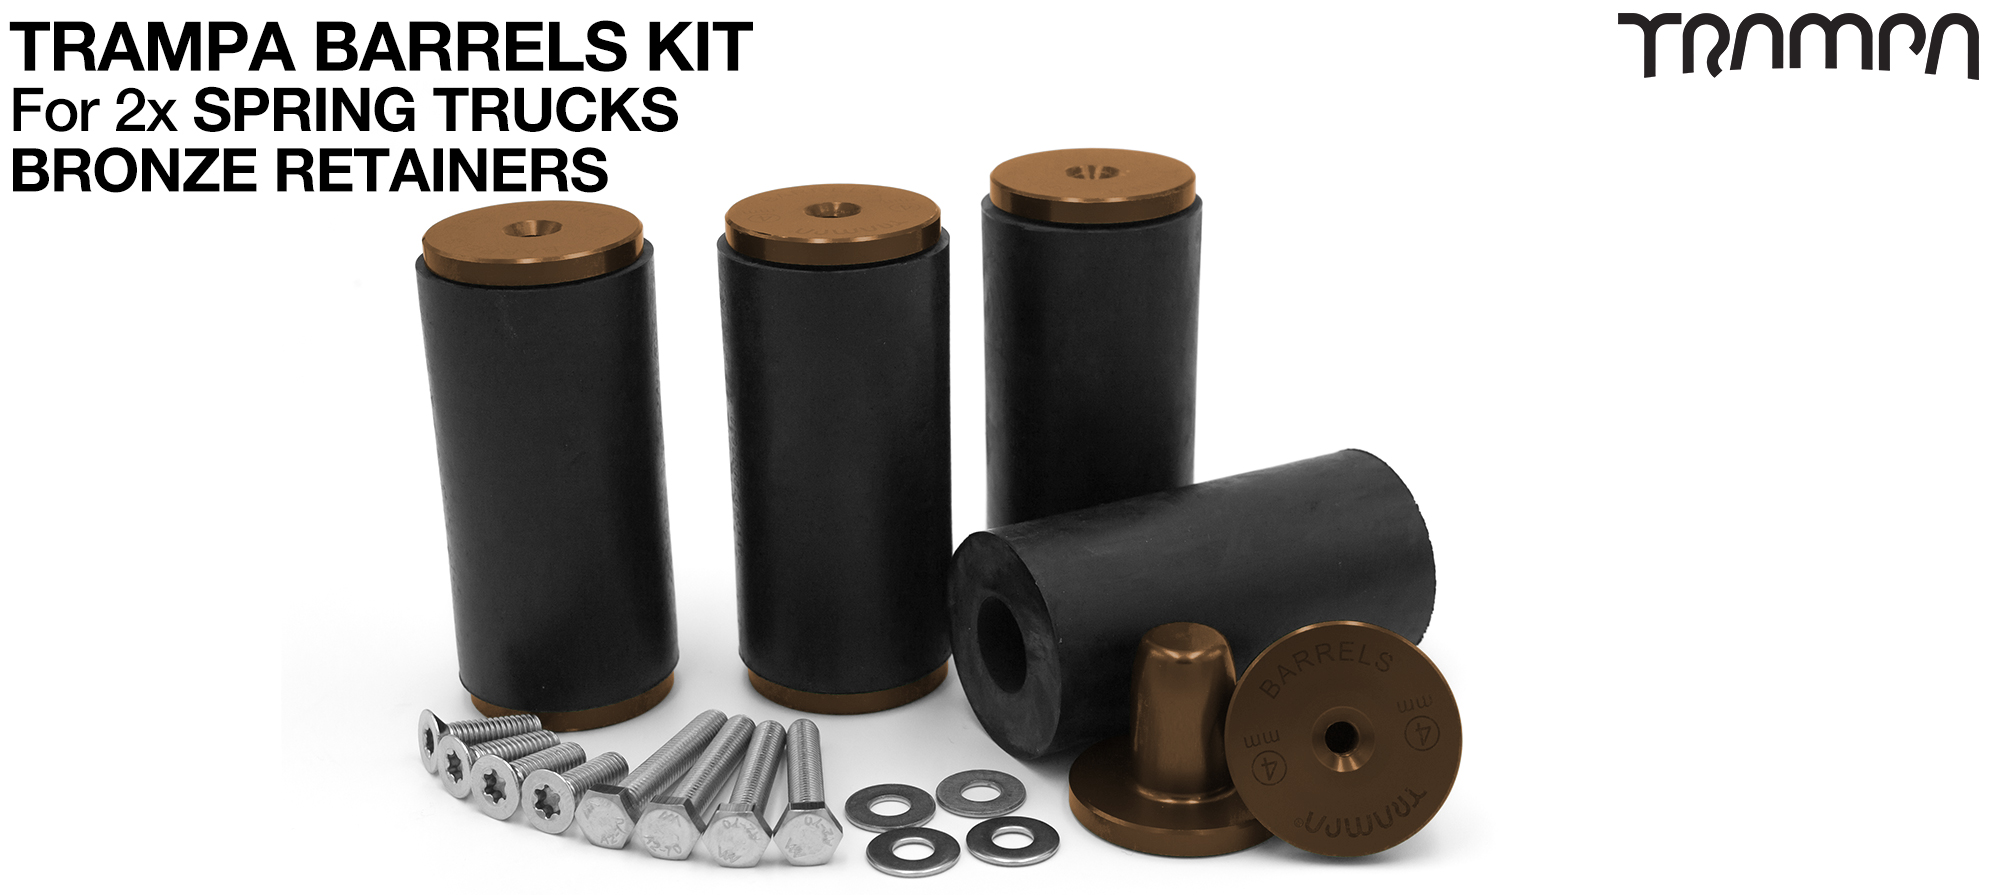 TRAMPA BARRELS Complete DECK Kit - BRONZE